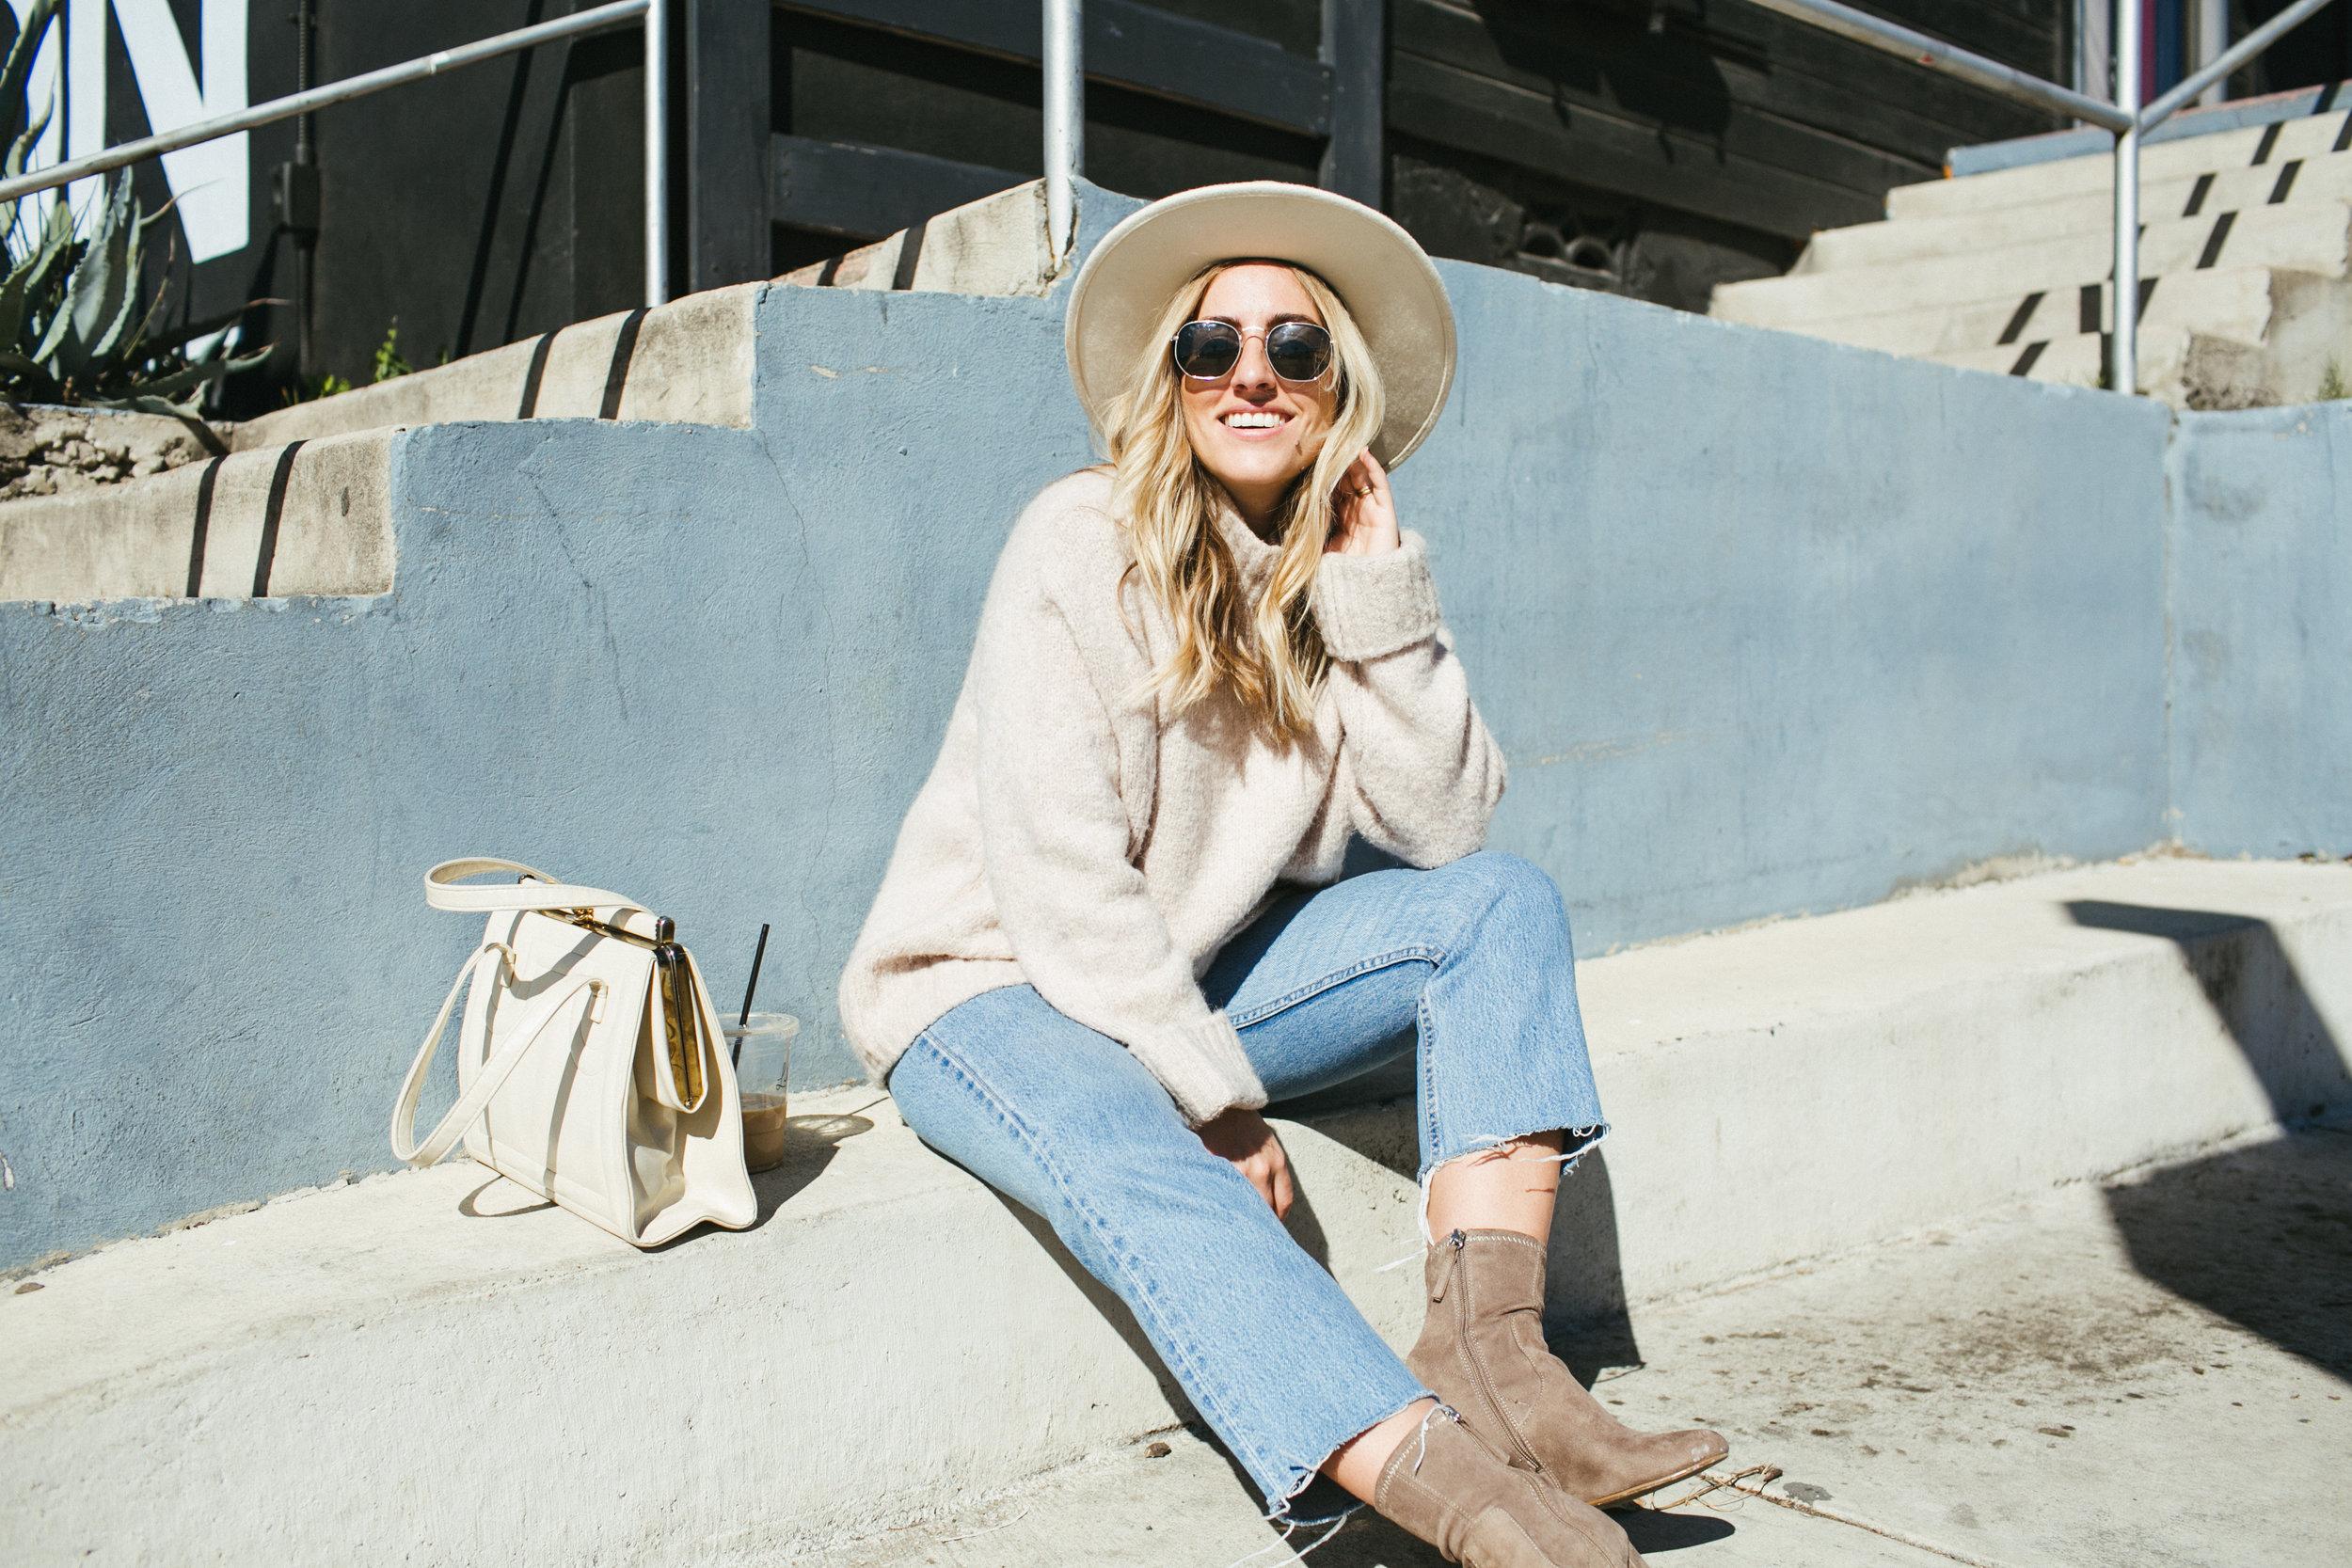 Paige-Newton-Lifestyle-Fashion-Blogger-Influencer-Photography-067.jpg